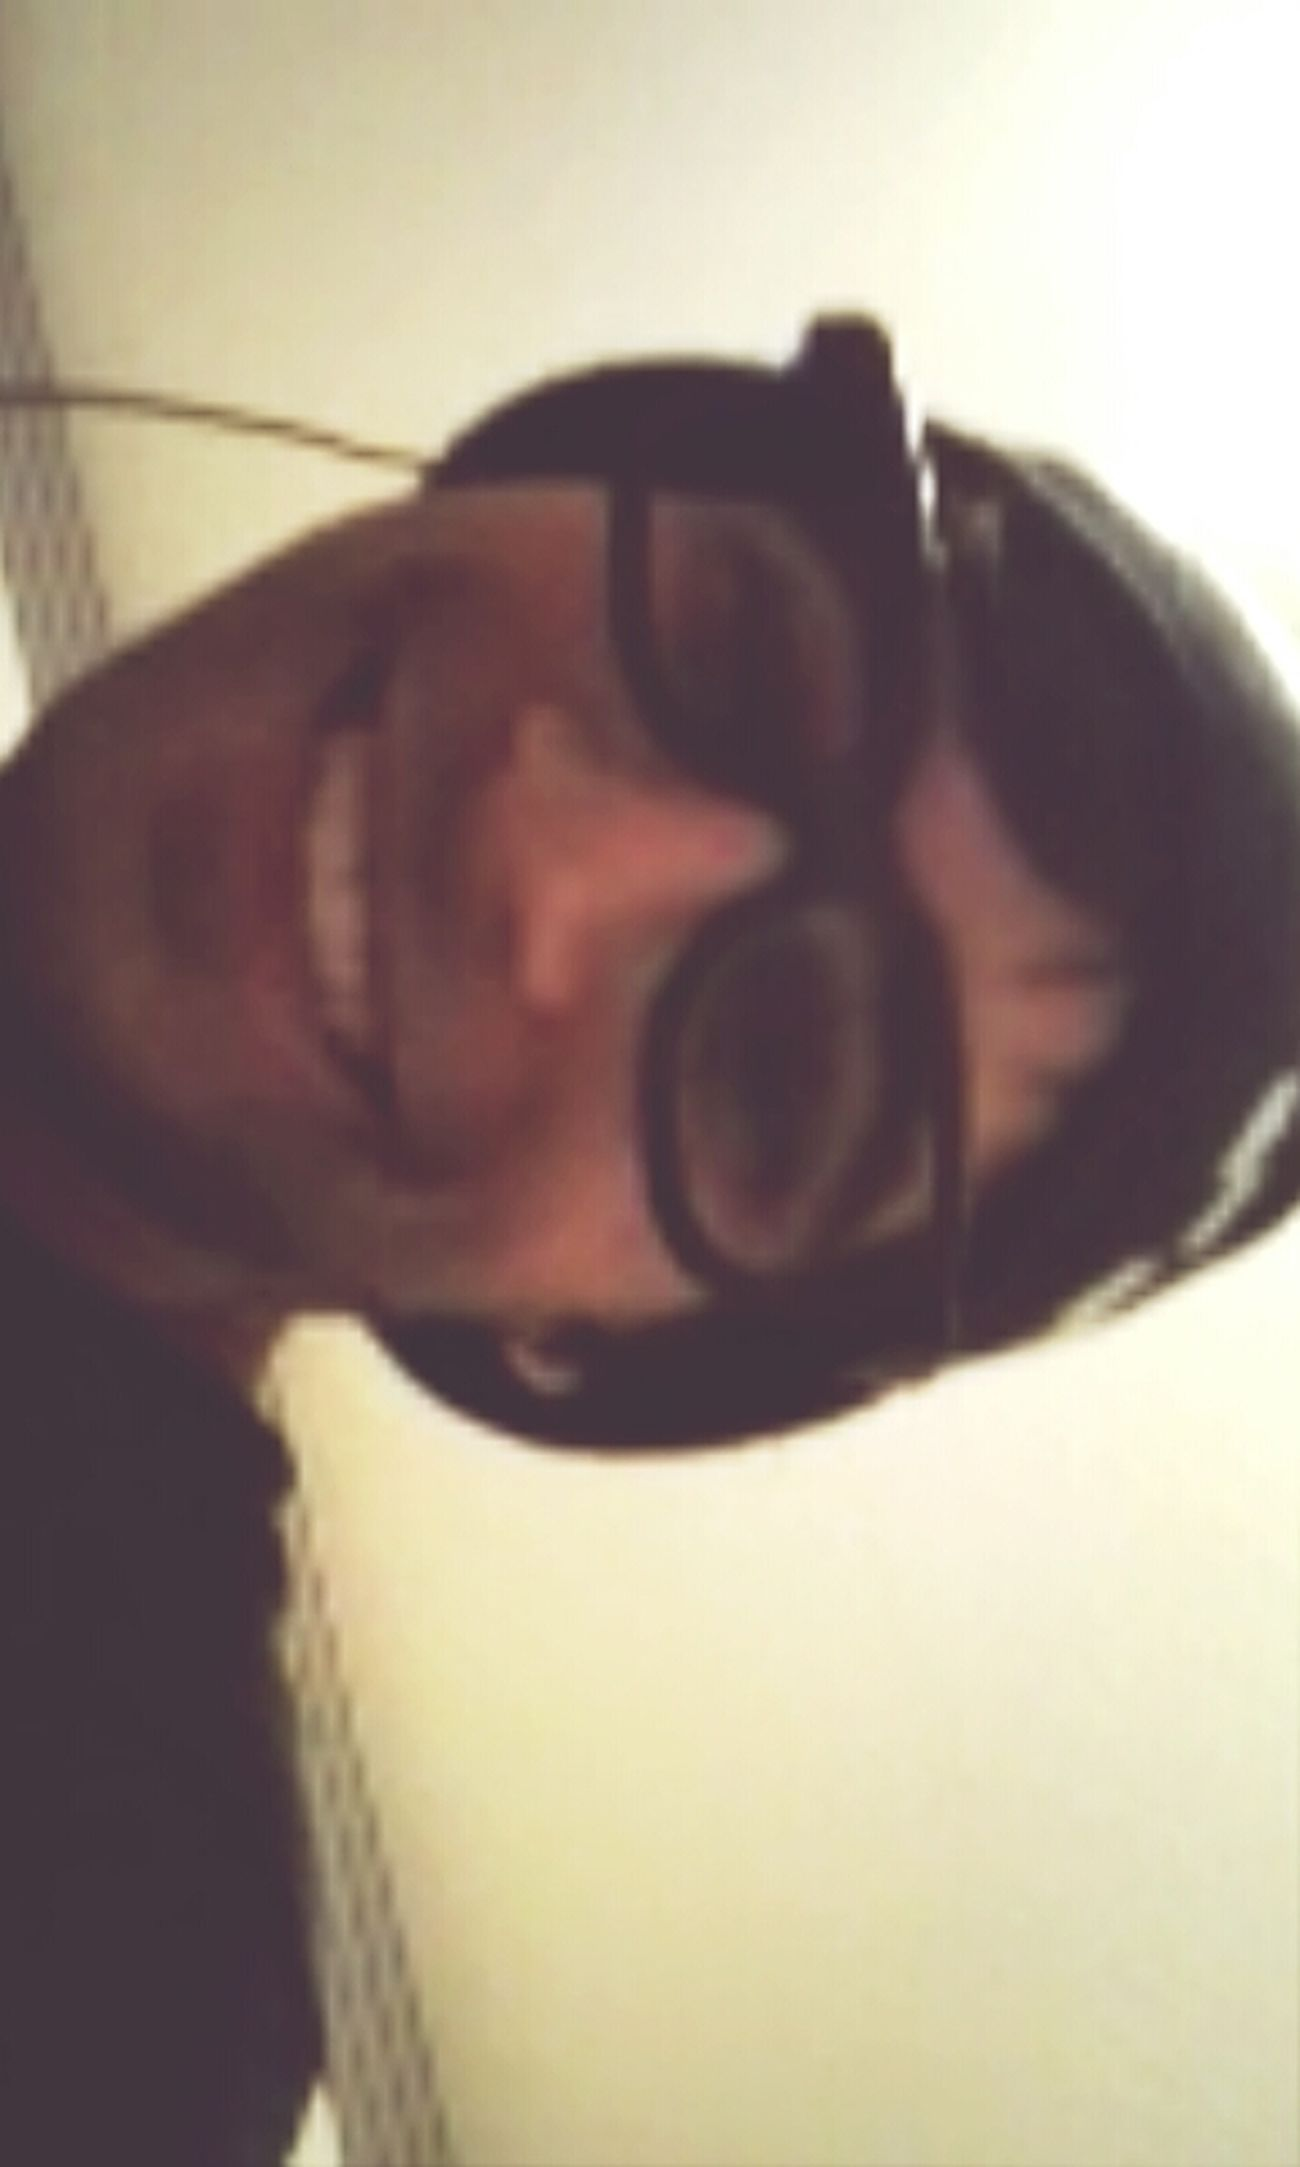 Anthony <3 skype c: